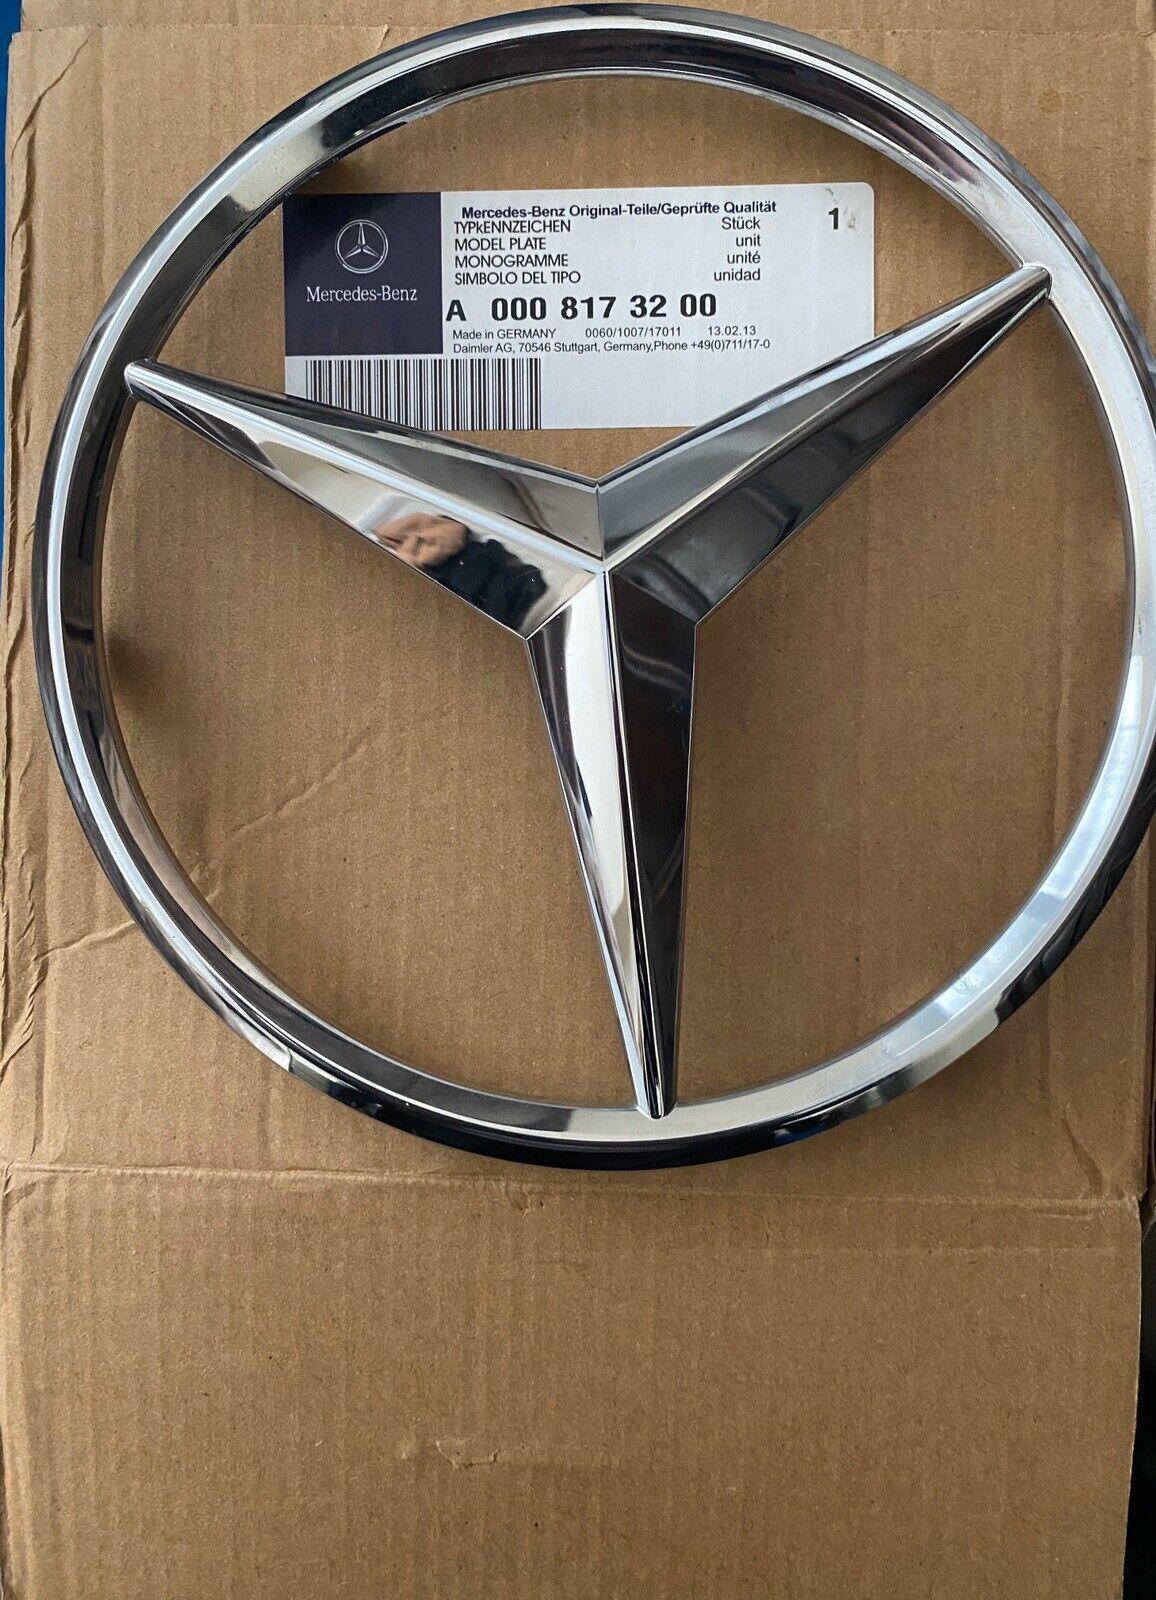 Genuine Mercedes-Benz Silver Radiator Grille Star Badge Emblem A0008173200 NEW